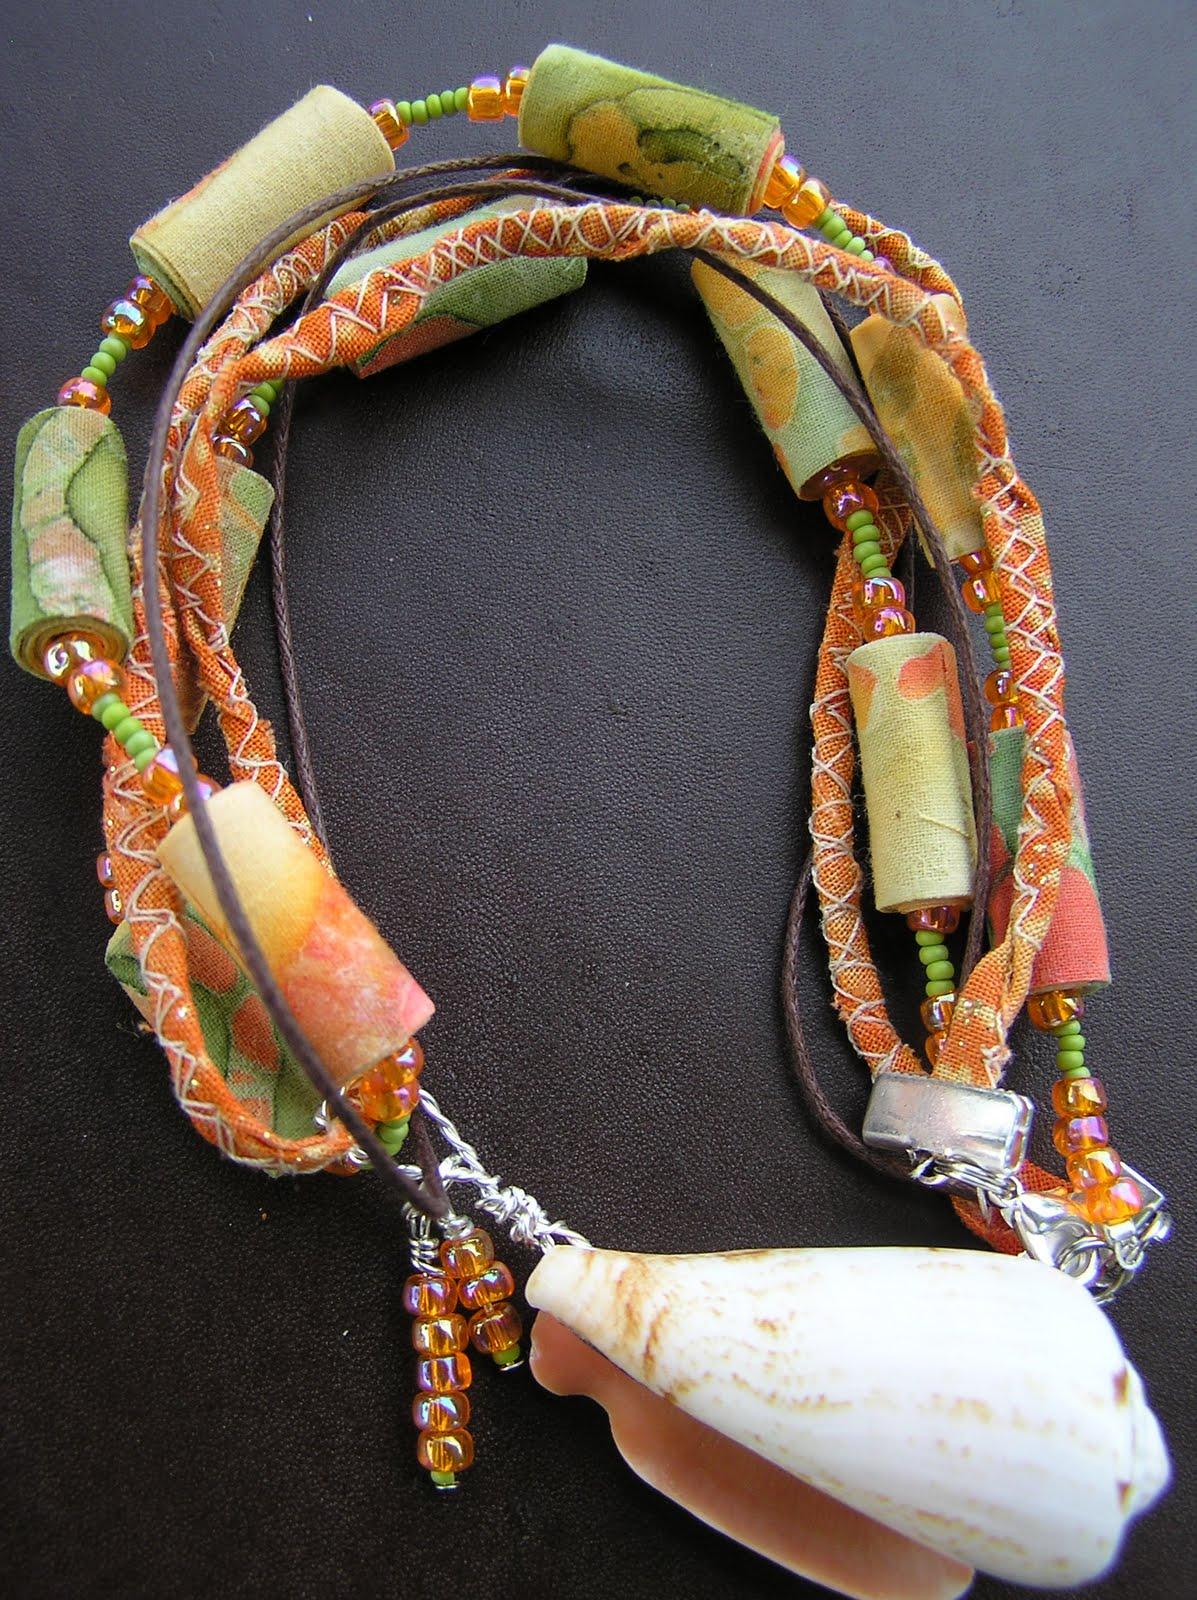 Honey Girl Studio Jewelry: July 2010